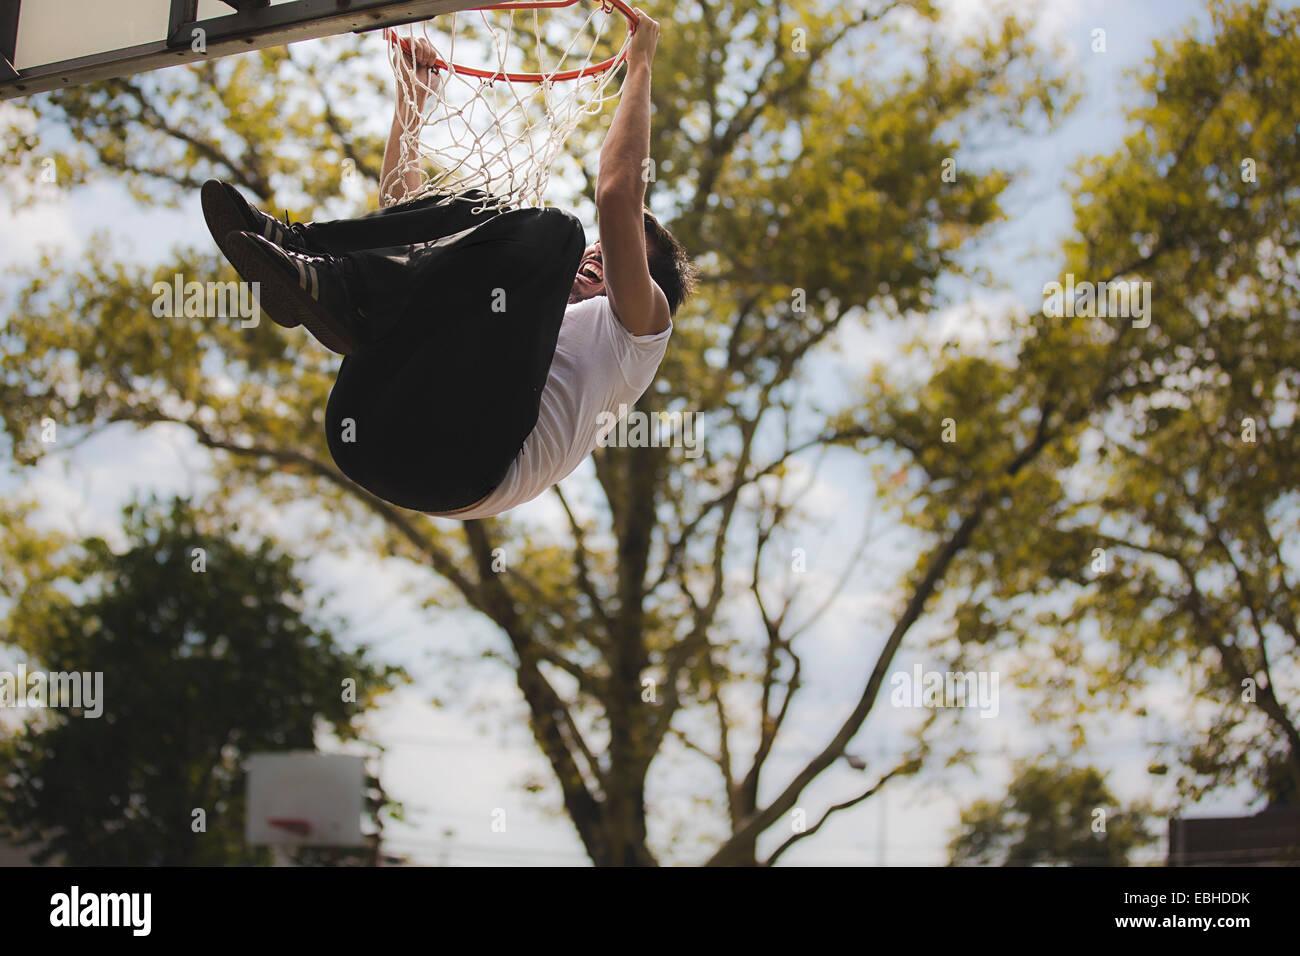 Basso angolo vista del giovane maschio basket appesi da Basketball hoop Foto Stock